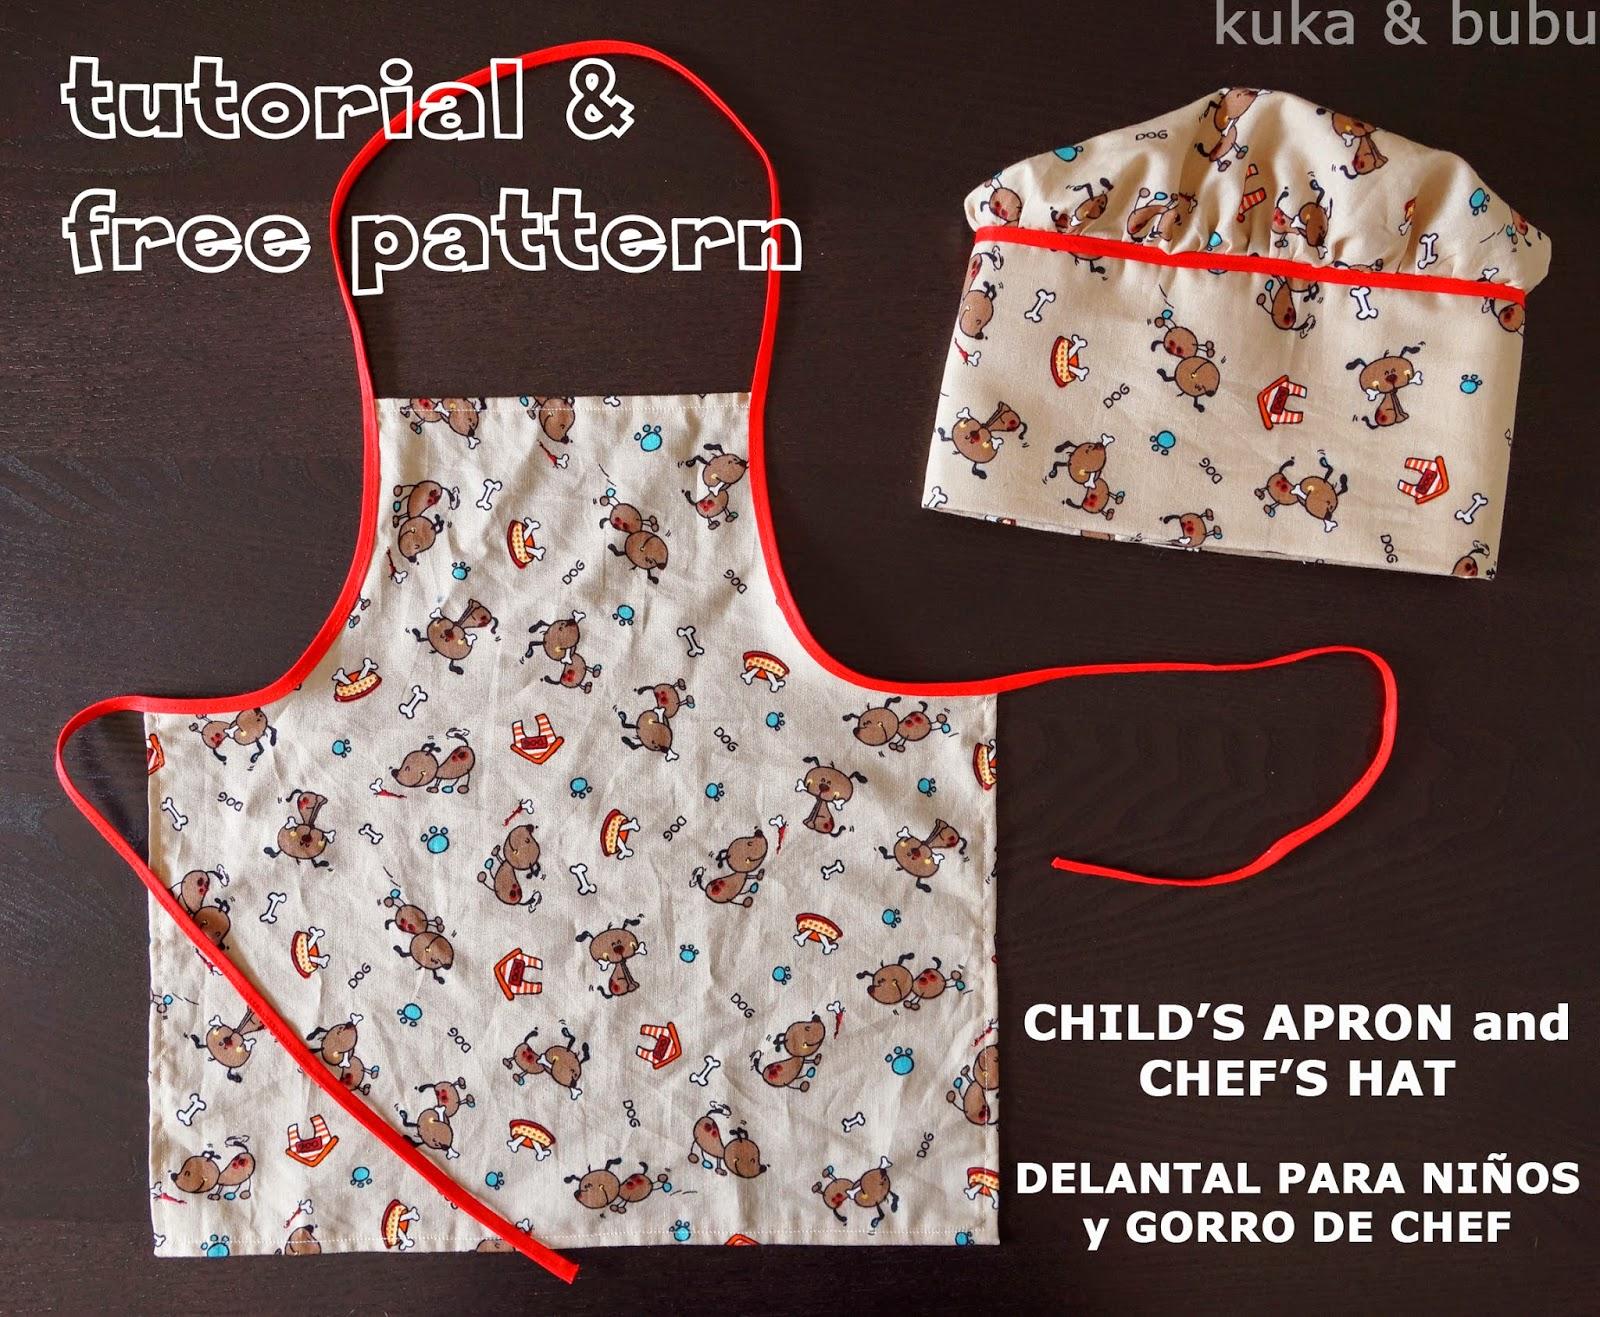 http://kukaandbubu.blogspot.com.es/2014/05/tutorial-free-pattern-apron-and-chefs.html